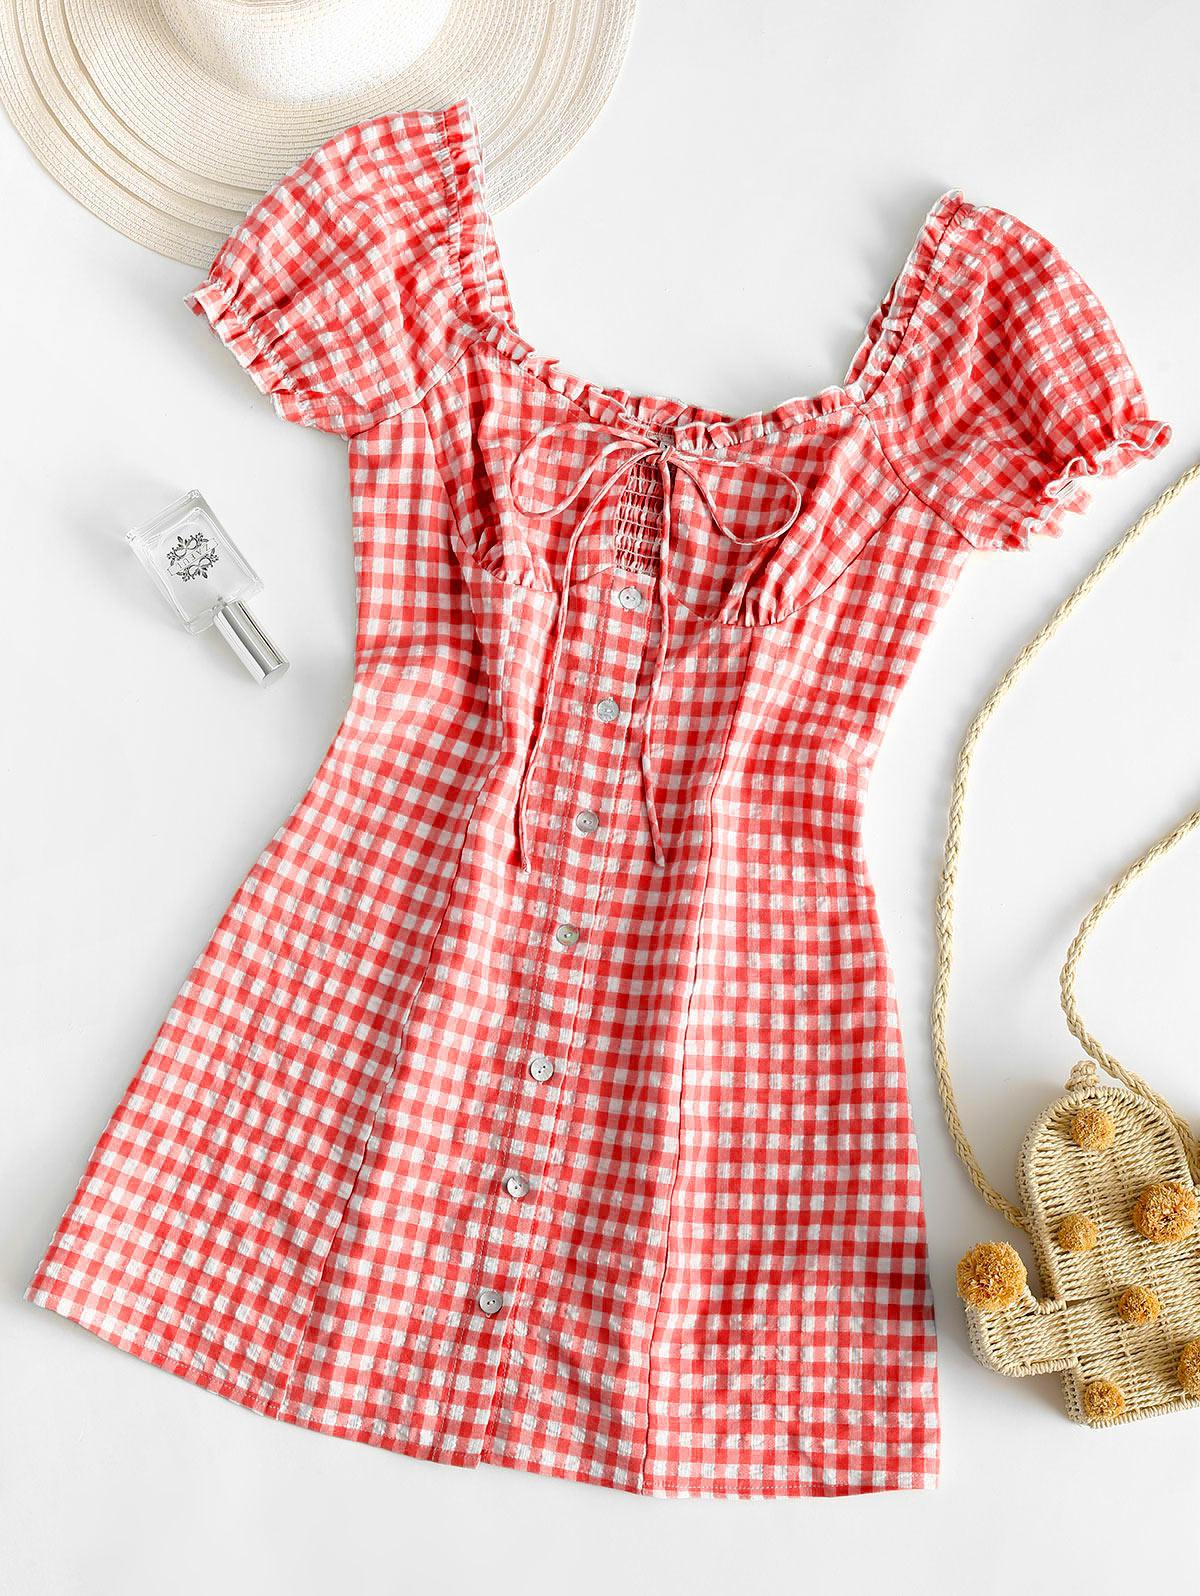 ZAFUL Buttoned Smocked Gingham Sheath Dress